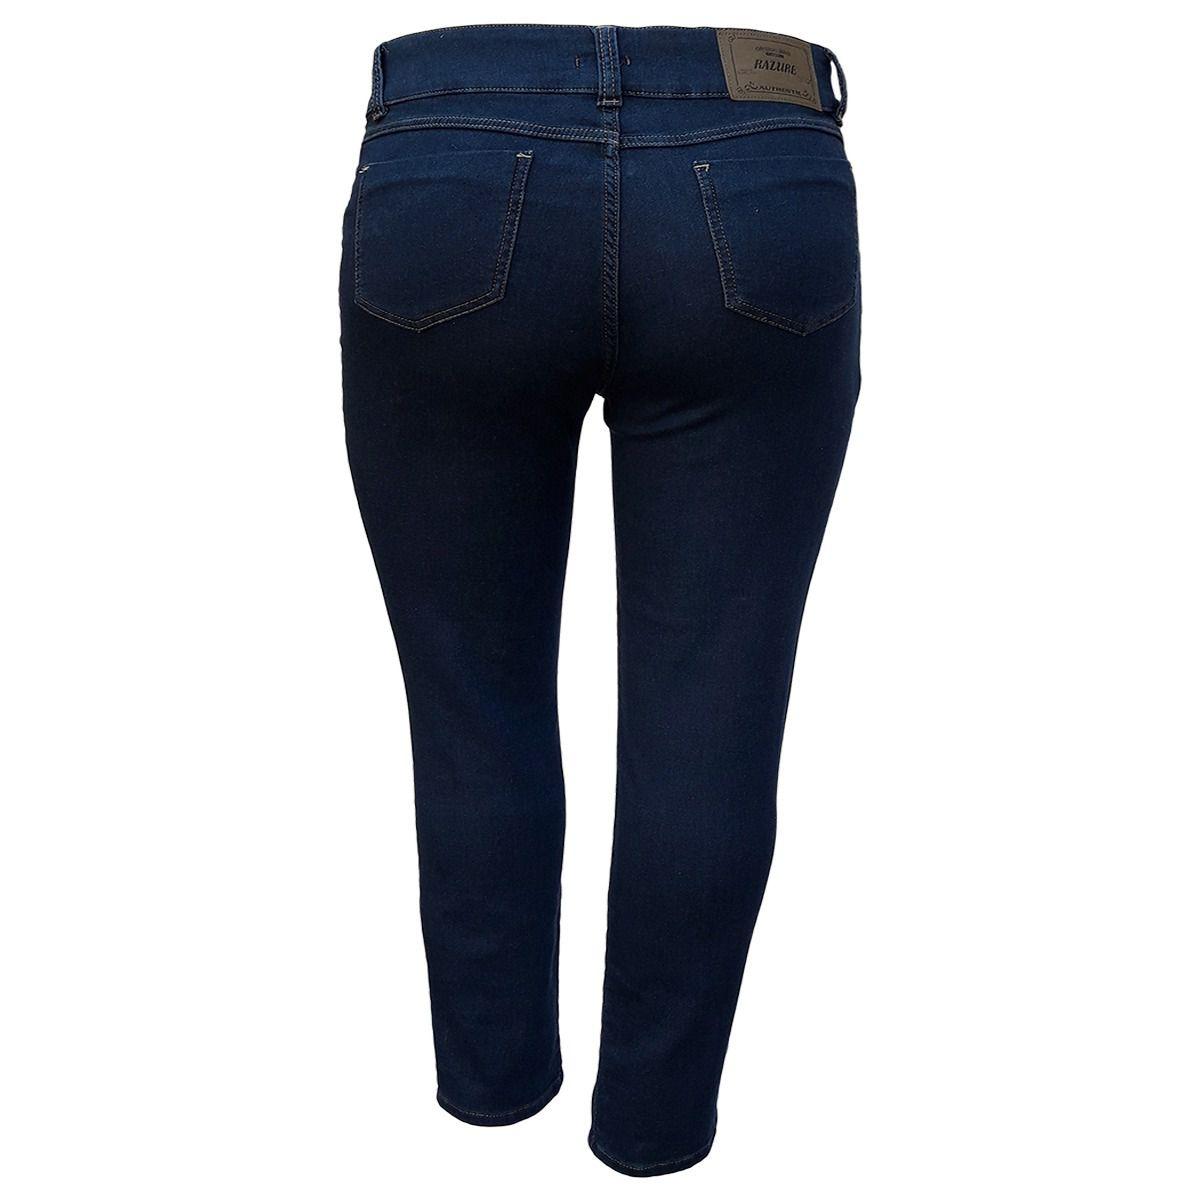 Calça Jeans Feminina Malha Denim Cintura Alta Plus Size